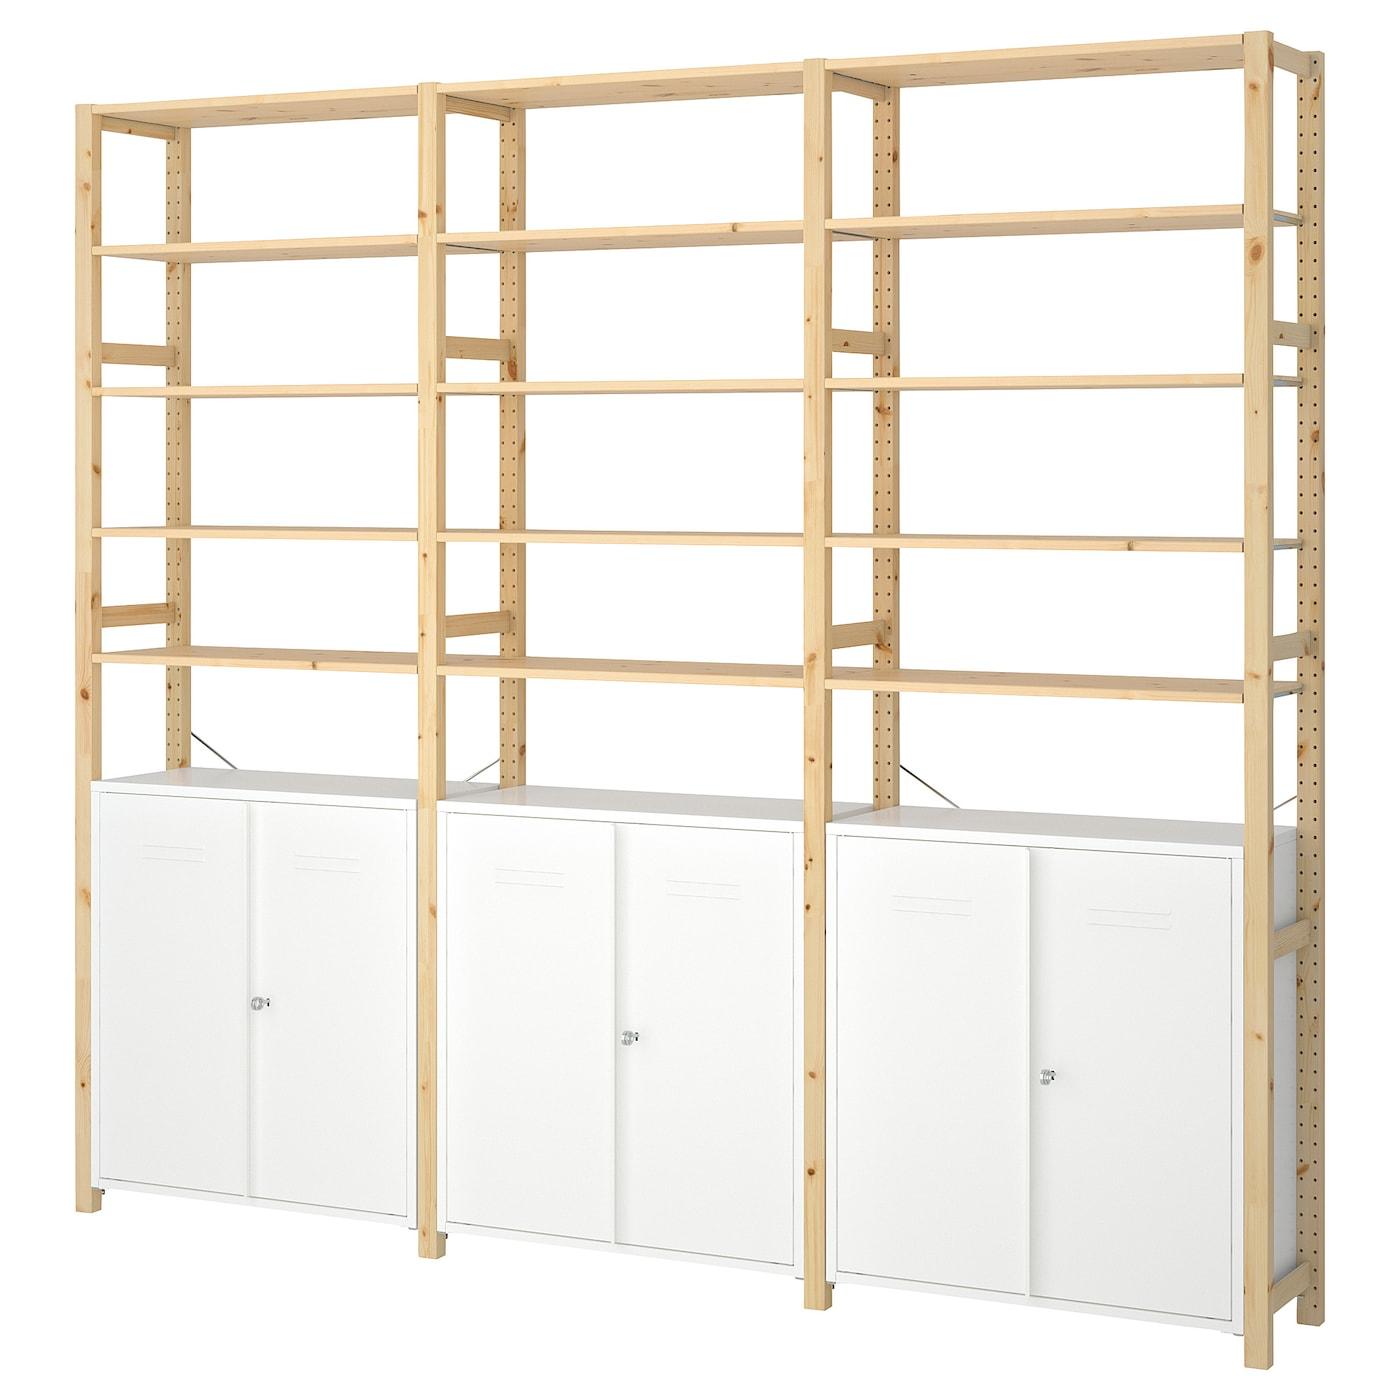 Ikea Ivar 3 Sections Cabinet Shelves